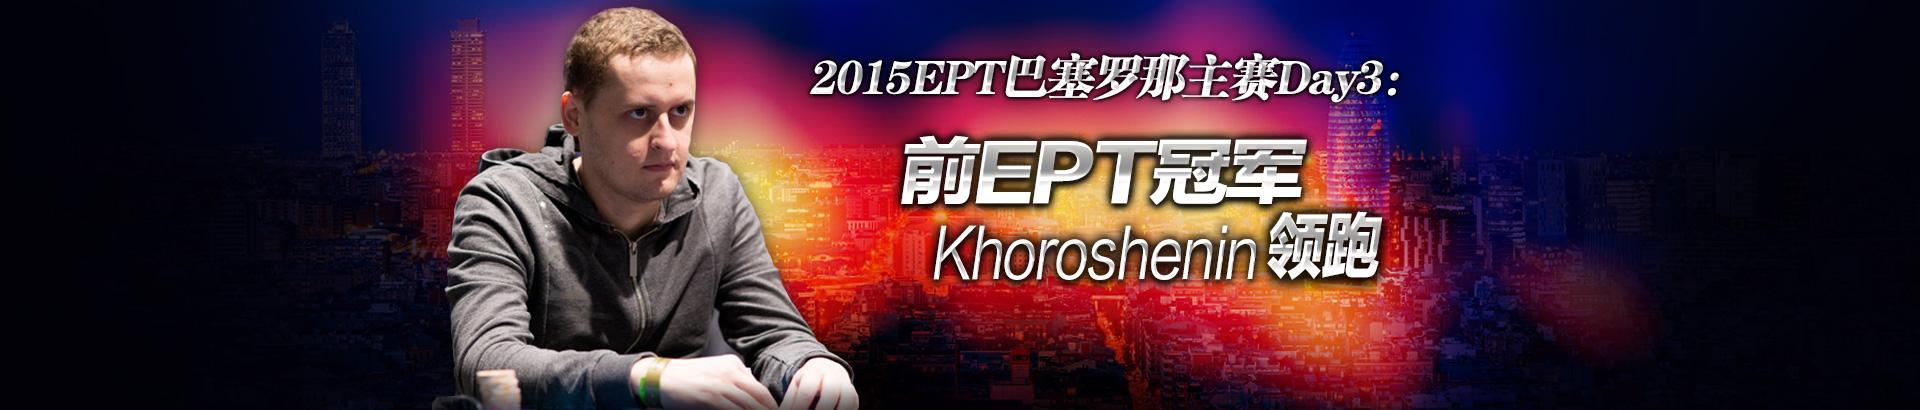 2015EPT巴塞罗那主赛Day3:前EPT冠军Khoroshenin领跑